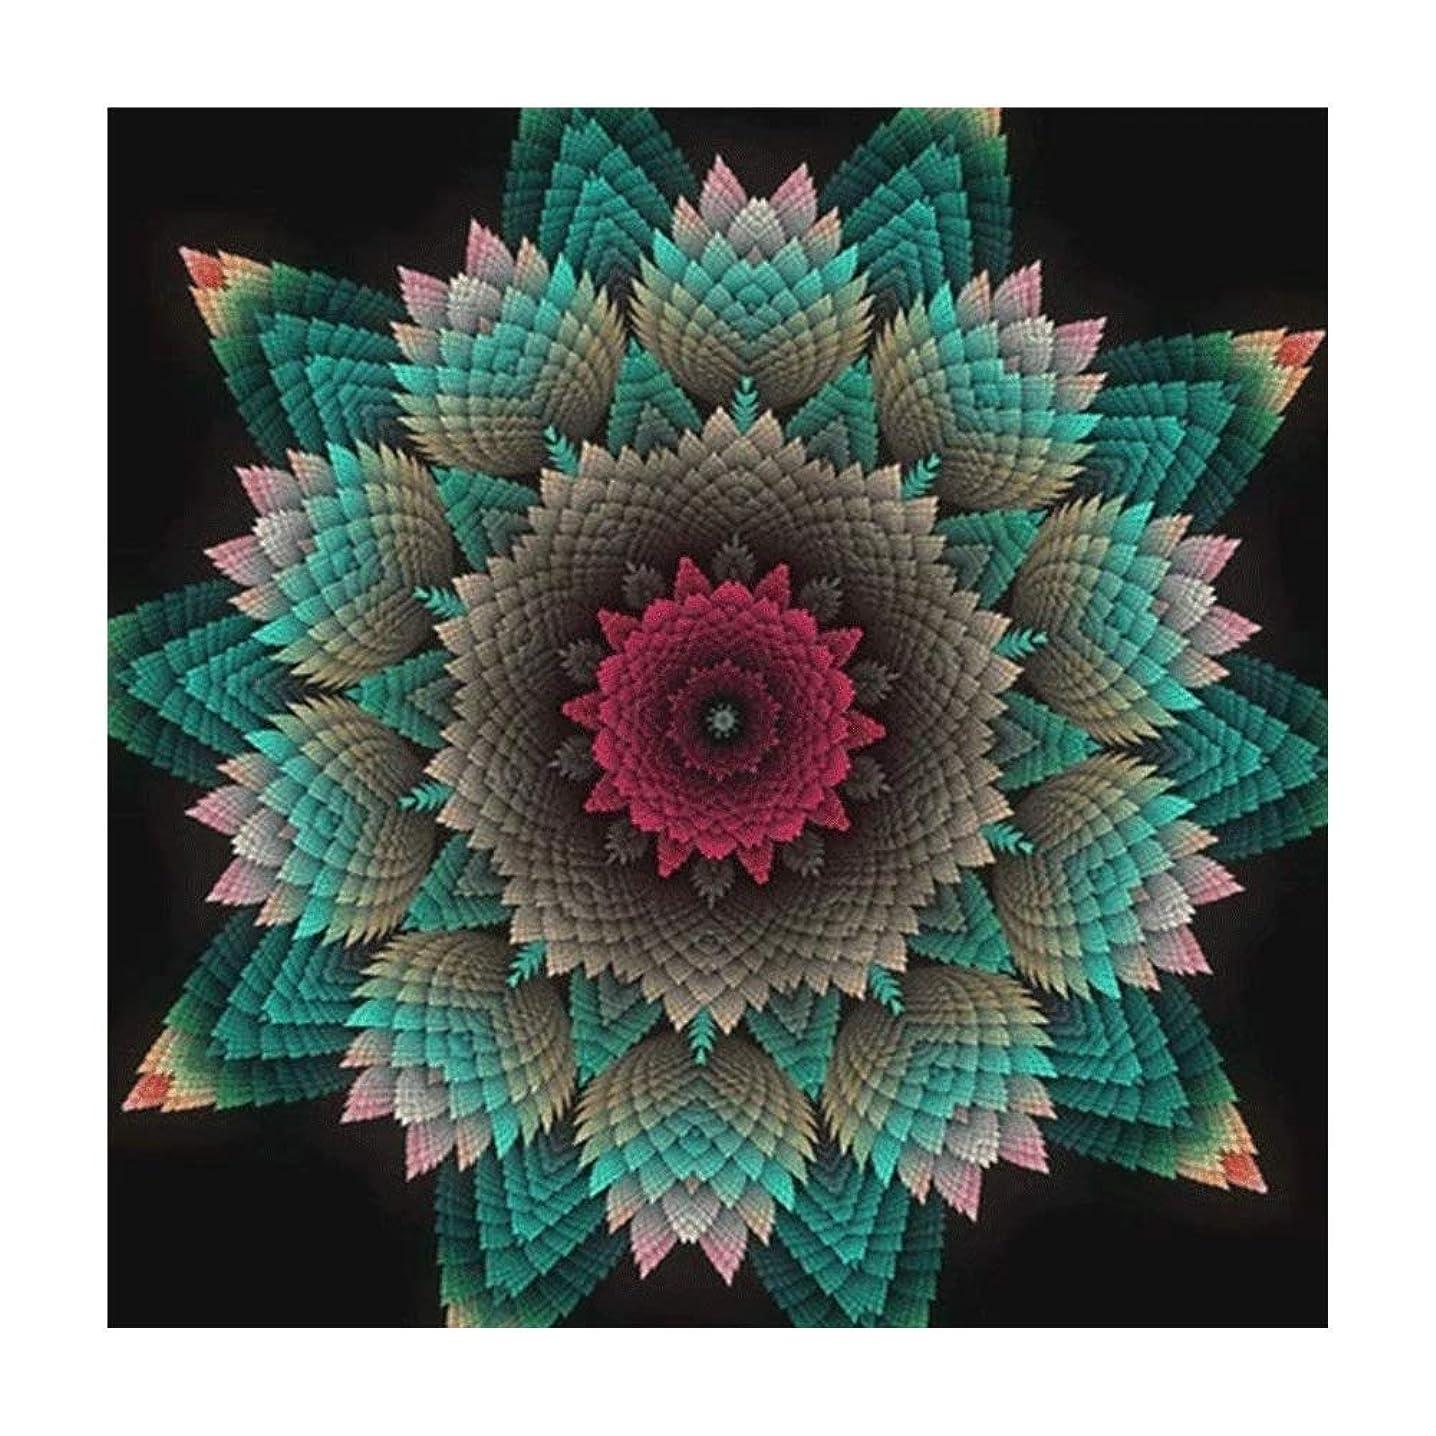 Customize 5D Diamond Painting Full drills Floral DIY Diamond Embroidery Kit Mandala Full Diamond Painting By Number Mosaic Cross Stitch Craft Needlework Decor